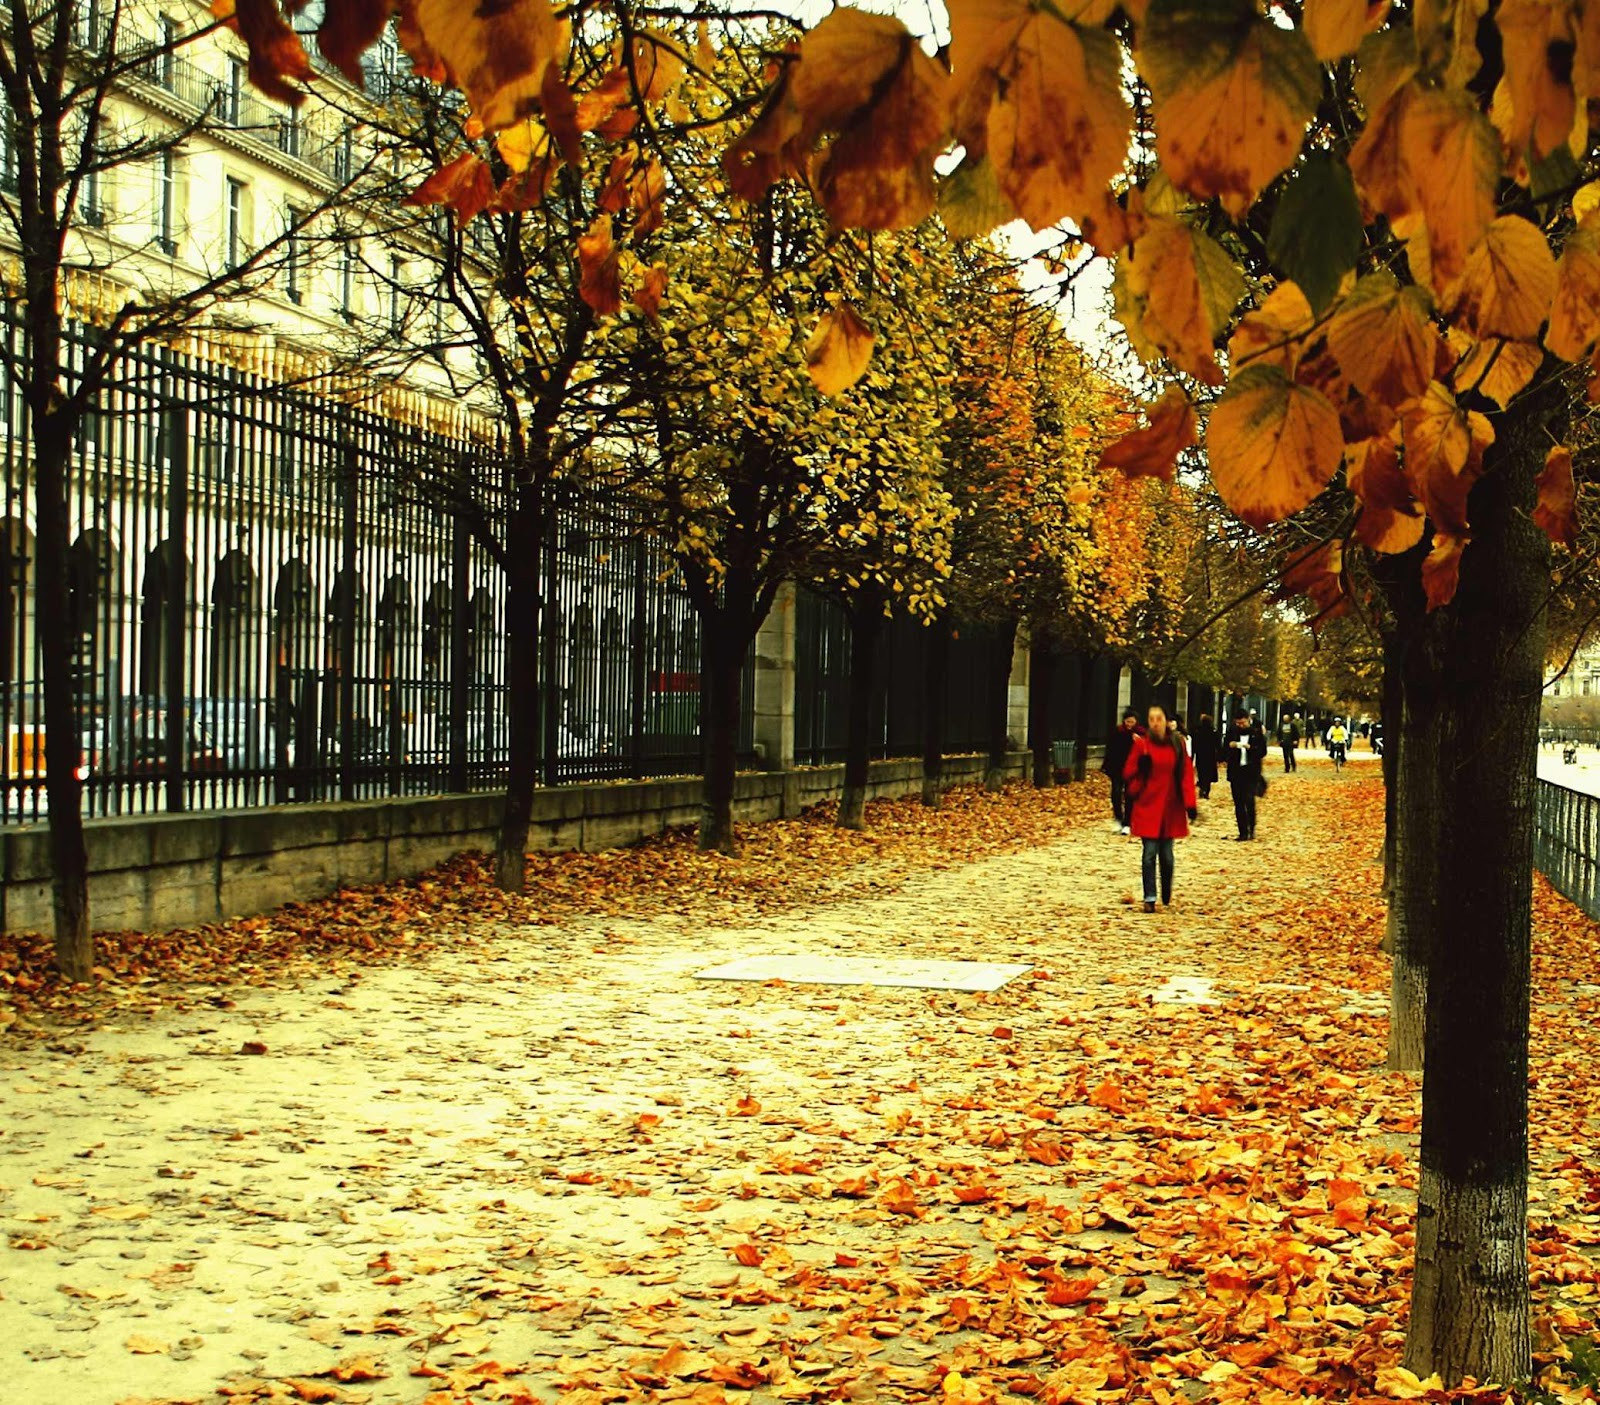 Autumn Street In Paris Hd Wallpaper Vicendi Consulting